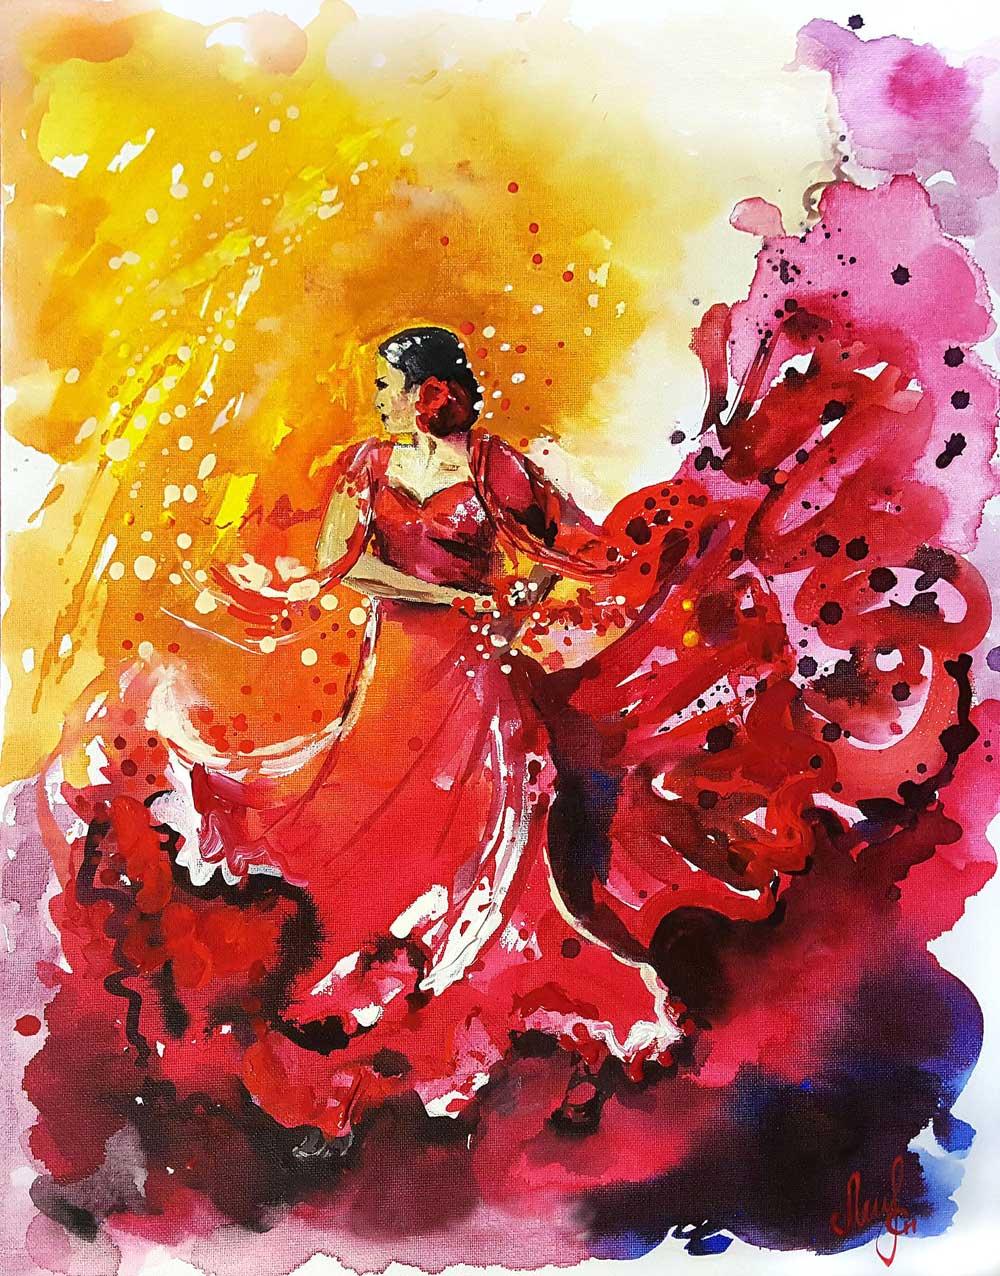 dance-series-Rhythms-of-passion-and-joy-Lana-Leuchuk